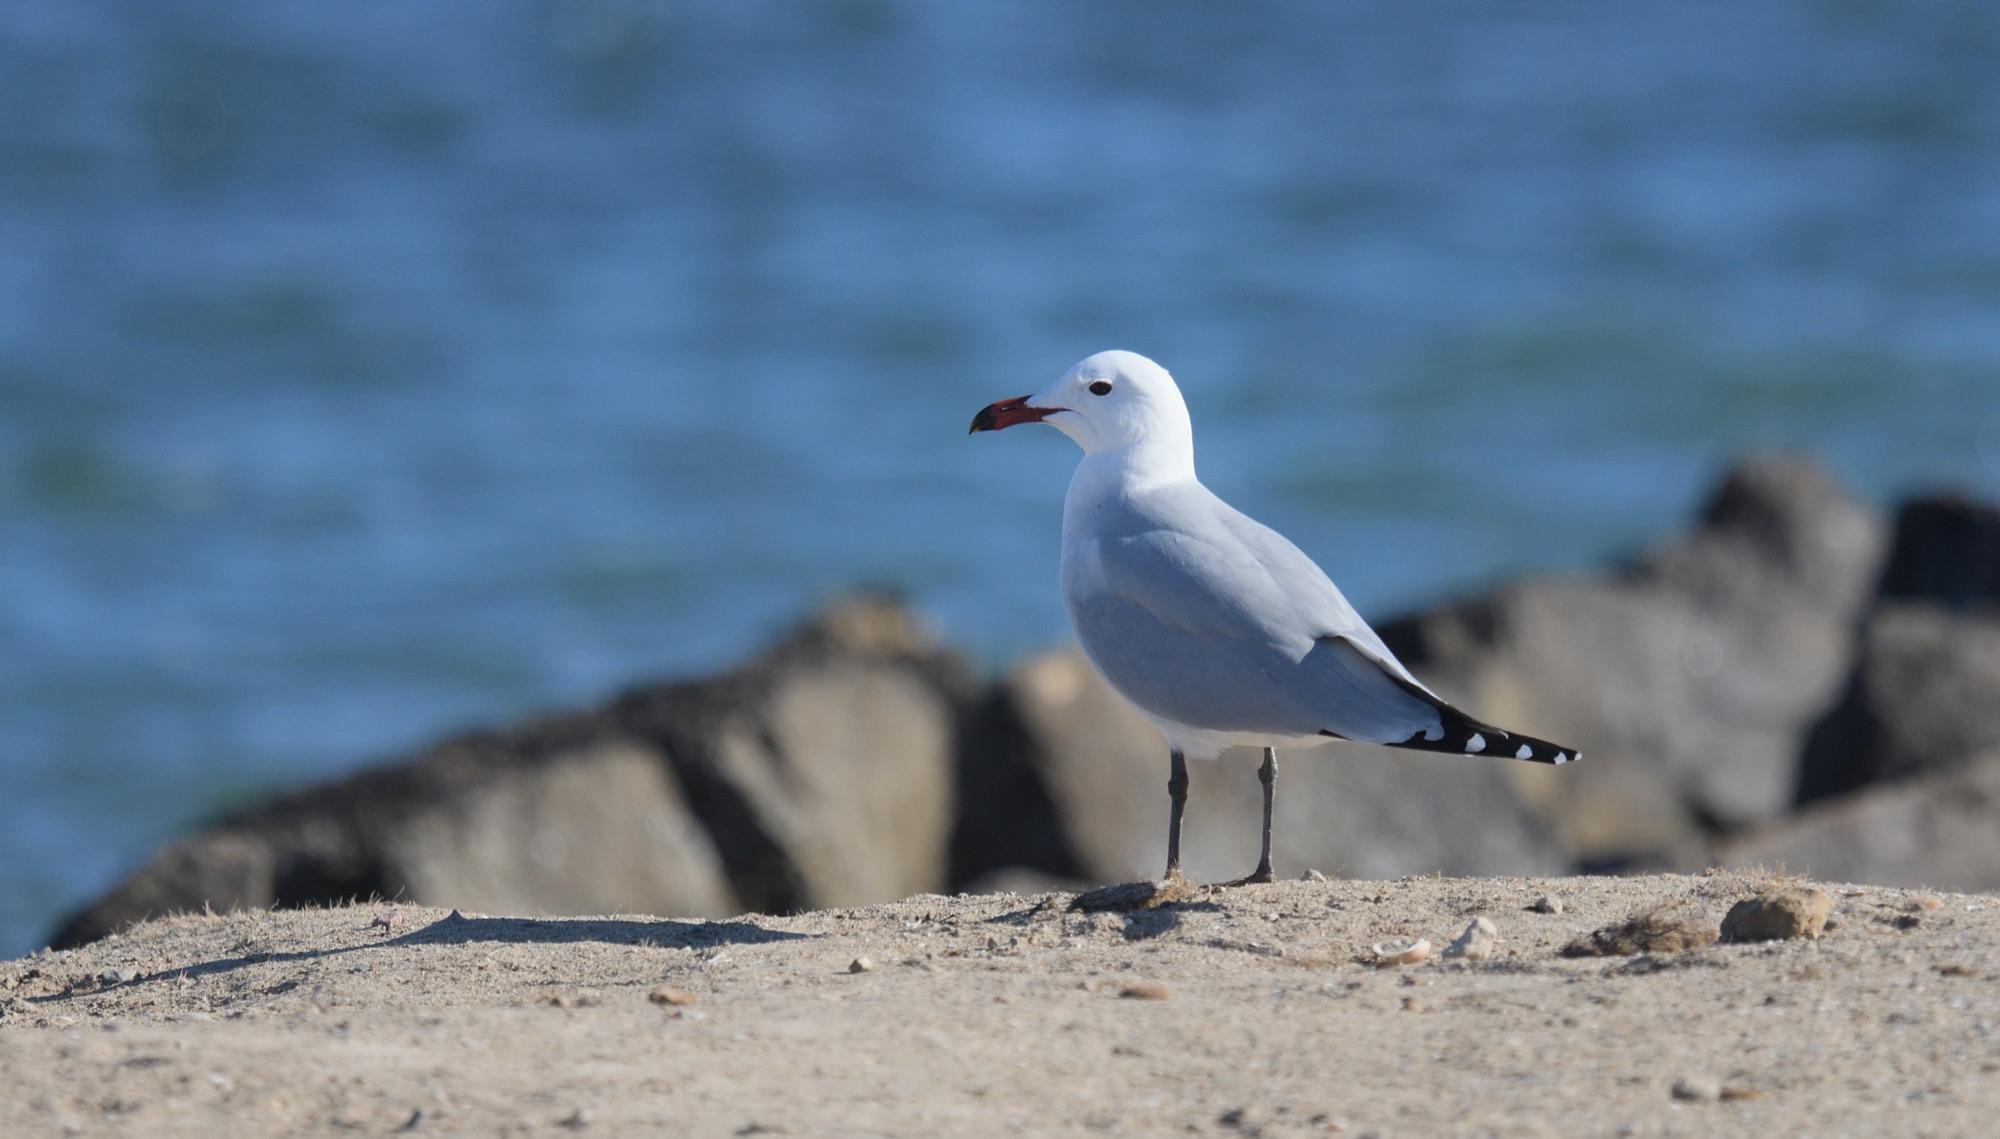 Audouin's Gull copyright Nick Bray